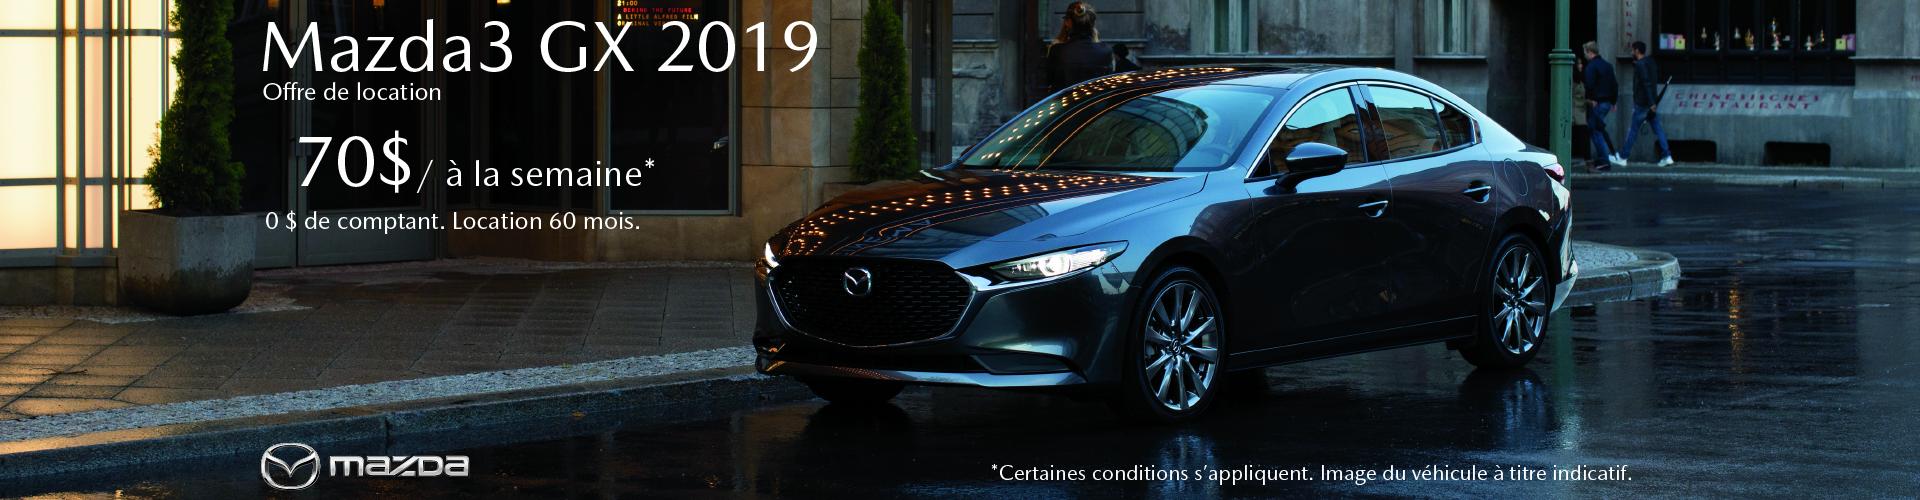 FR Mazda3 GX 2019 (St-Laurent)